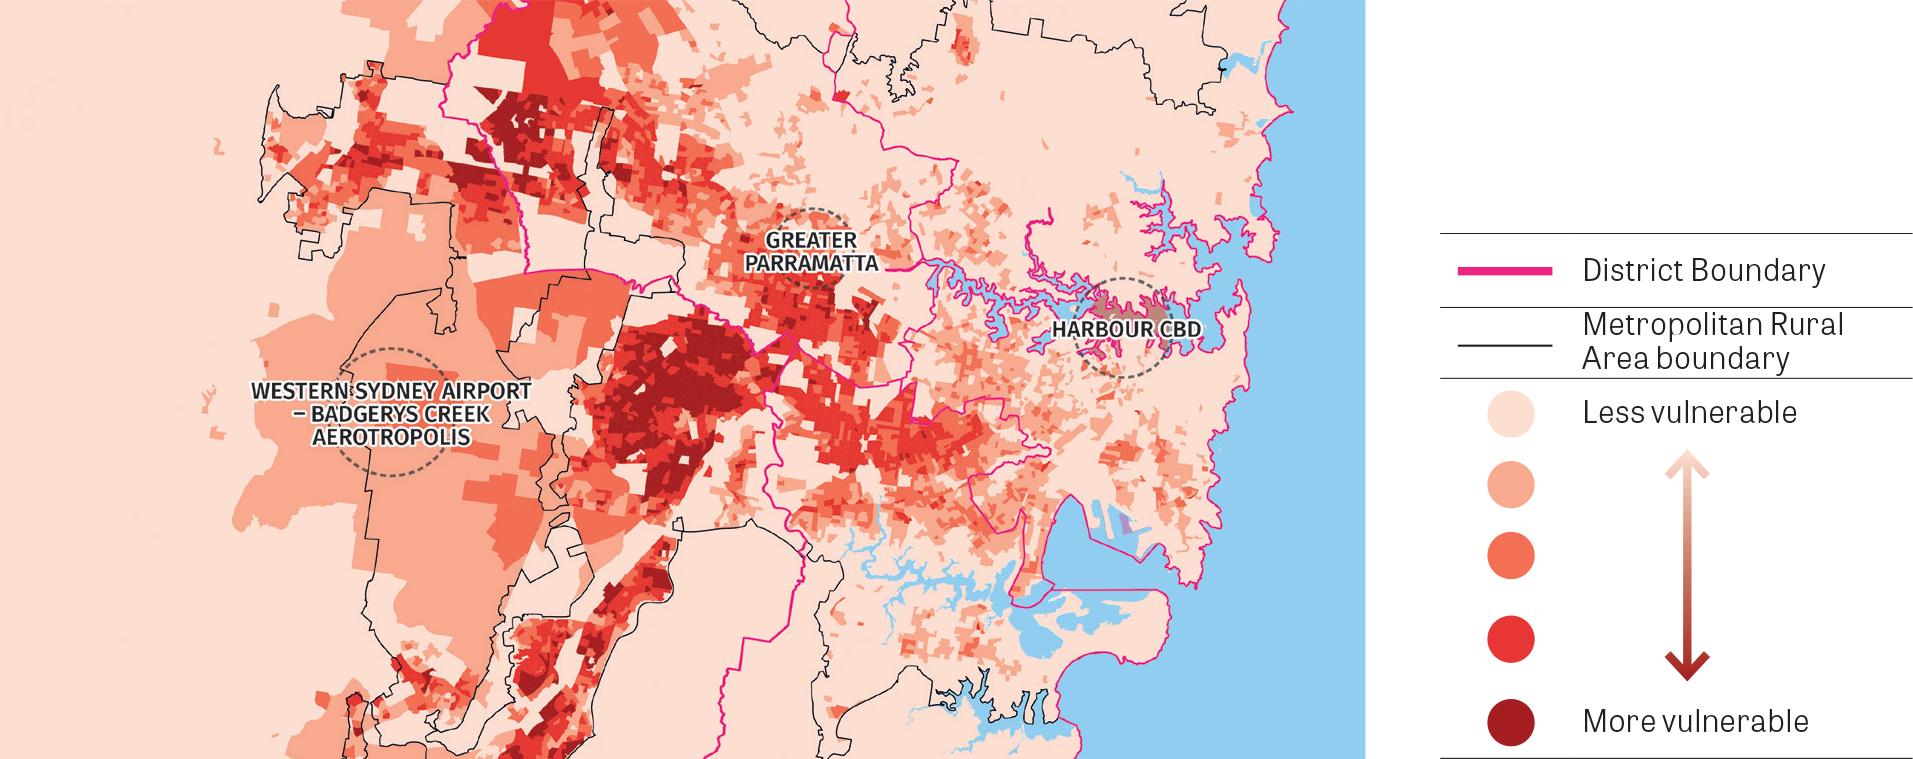 """Figure 27:  Map showing Vulnerability to heatwaves. Source:  Australian Bureau of Statistics Socioeconomic Index For Areas (2011) & CSIRO Landsat 5 LST (Land surface temperature) for 02/02/2011 (2011). Analysis by Kinesis (2016)."""